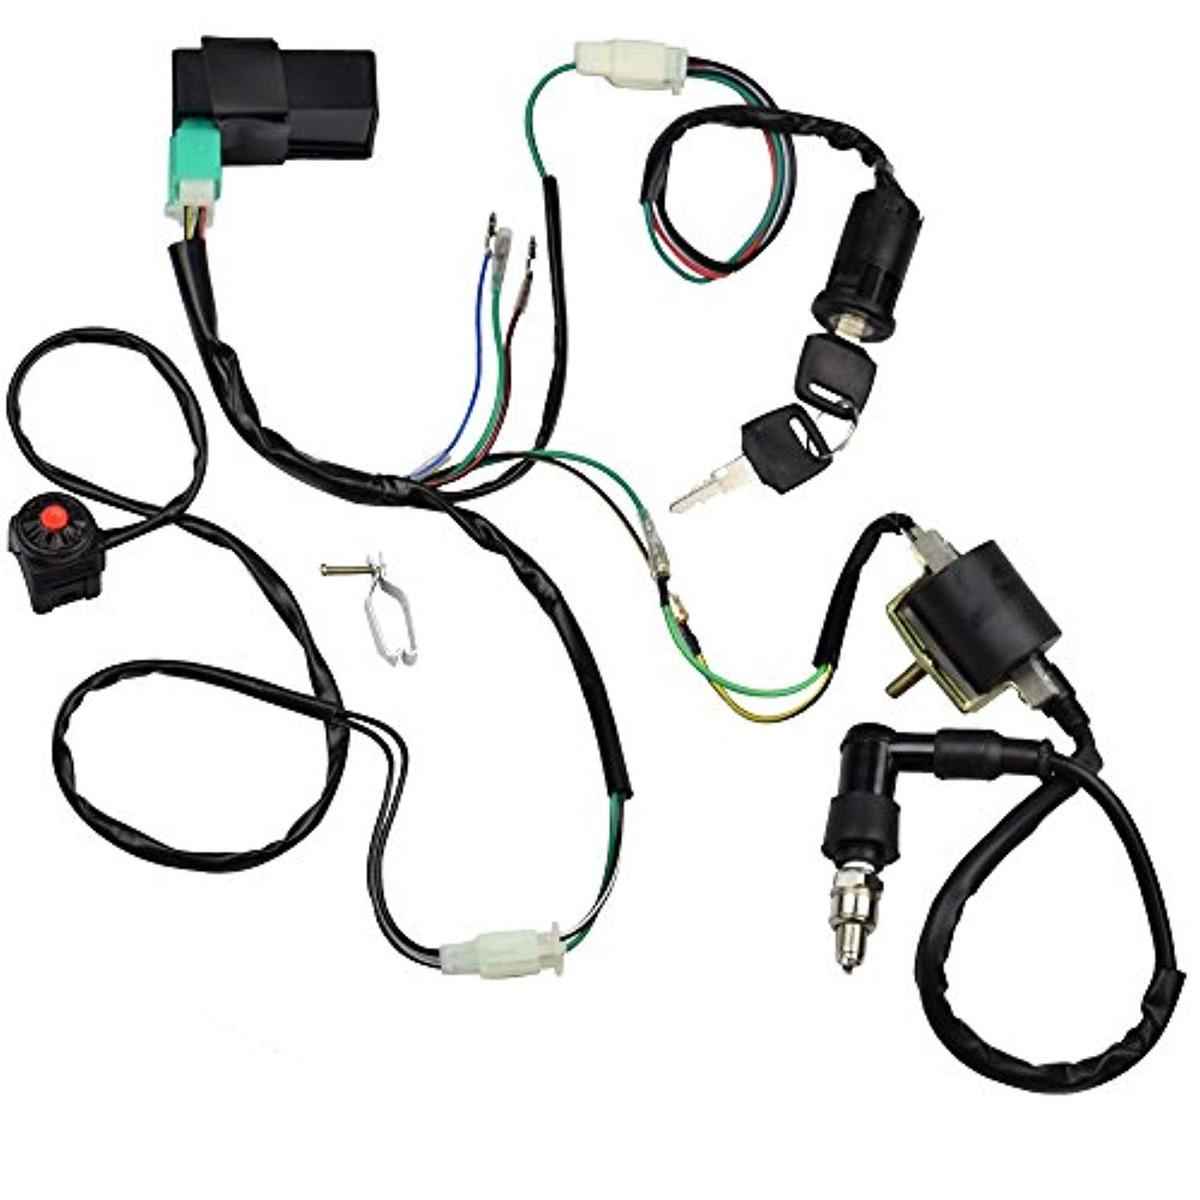 Minireen Wire Harness Wiring Loom Cdi Ignition on cable loom, crazy loom, wood loom, carpet loom,